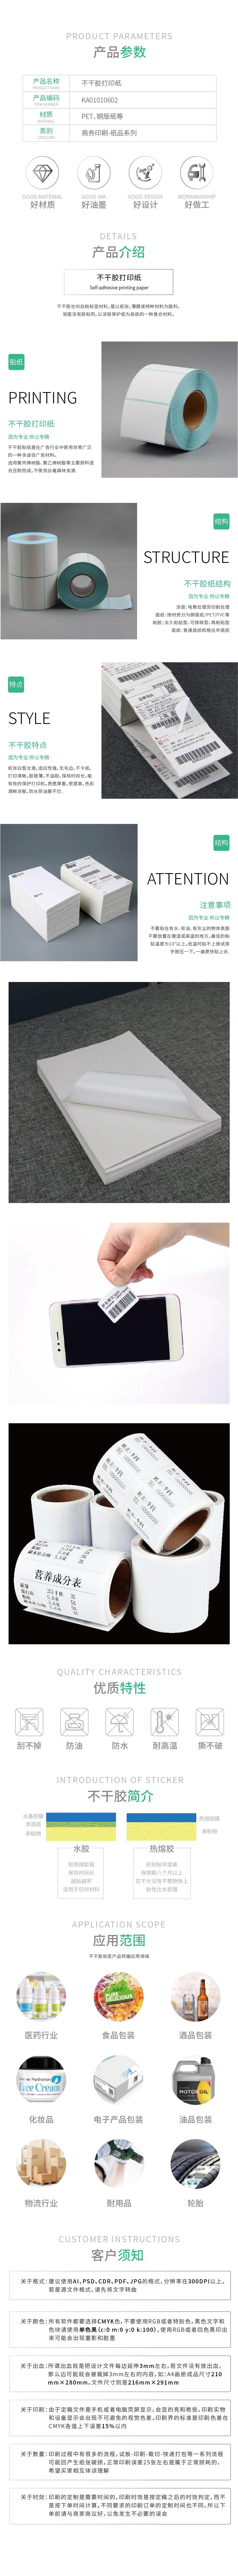 KA010105-KA010106产品详情_不干胶打印纸.jpg